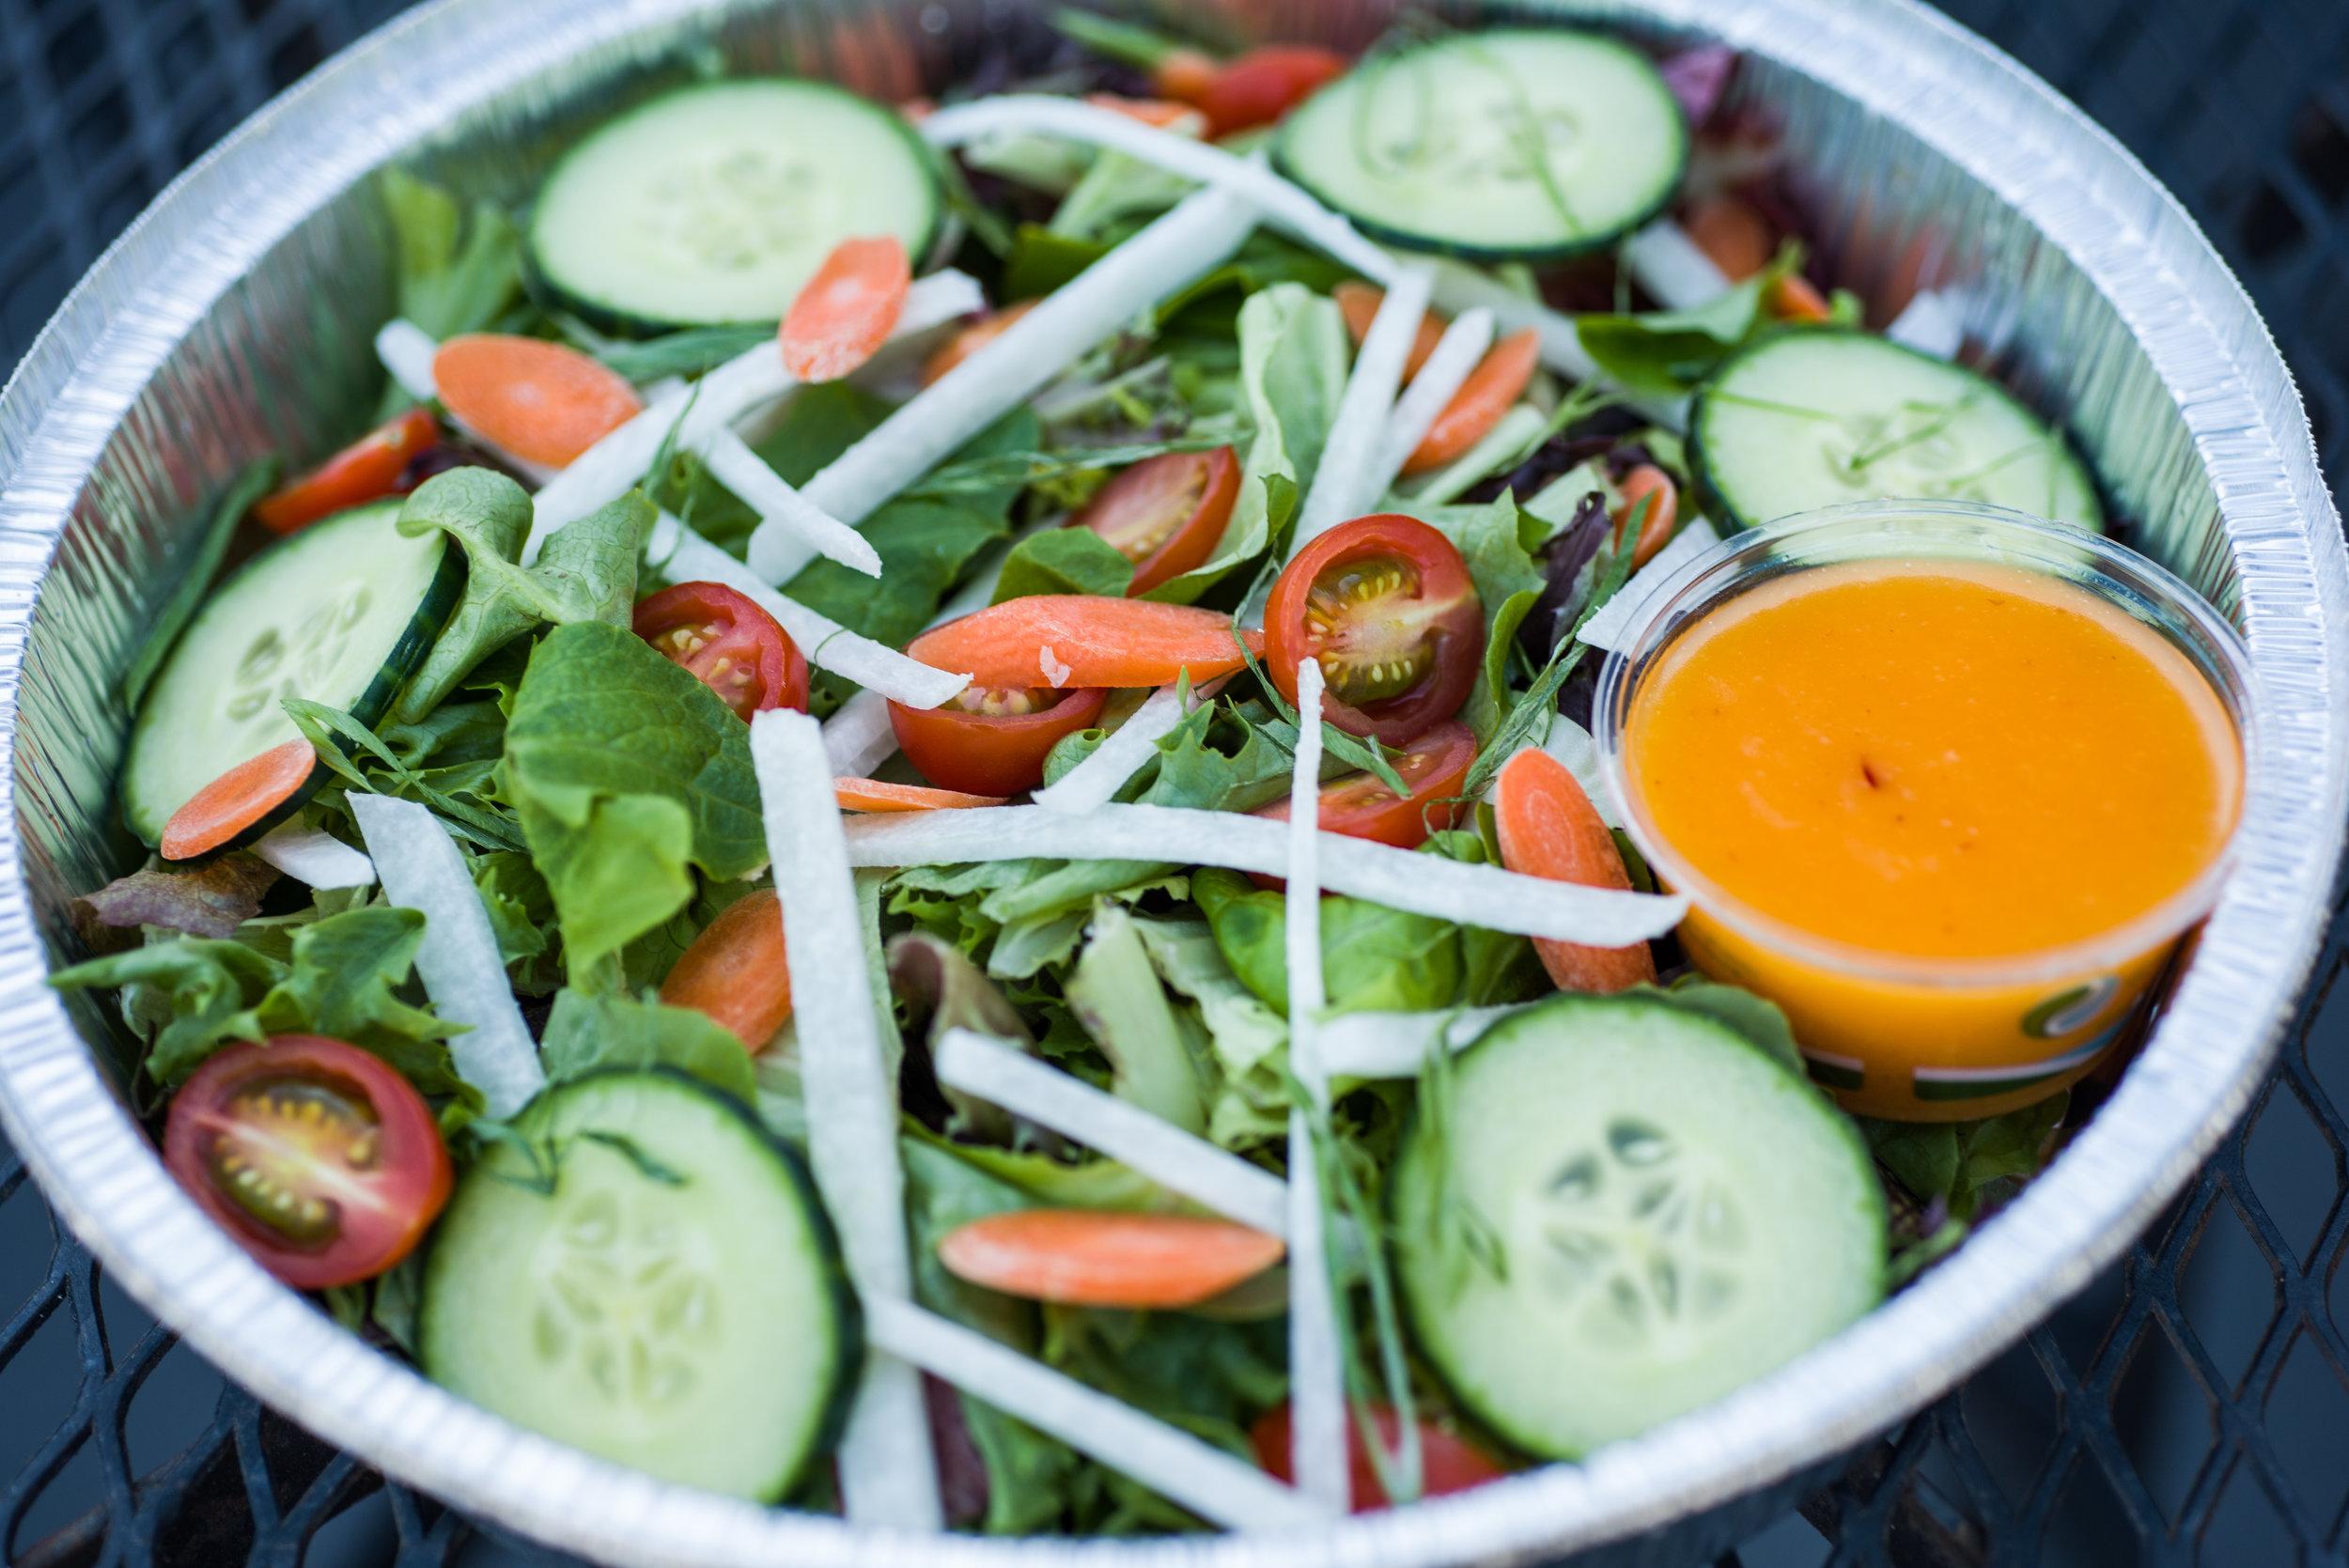 015-shooby-doo-catering-menu-prep-petrichor-photo.jpg